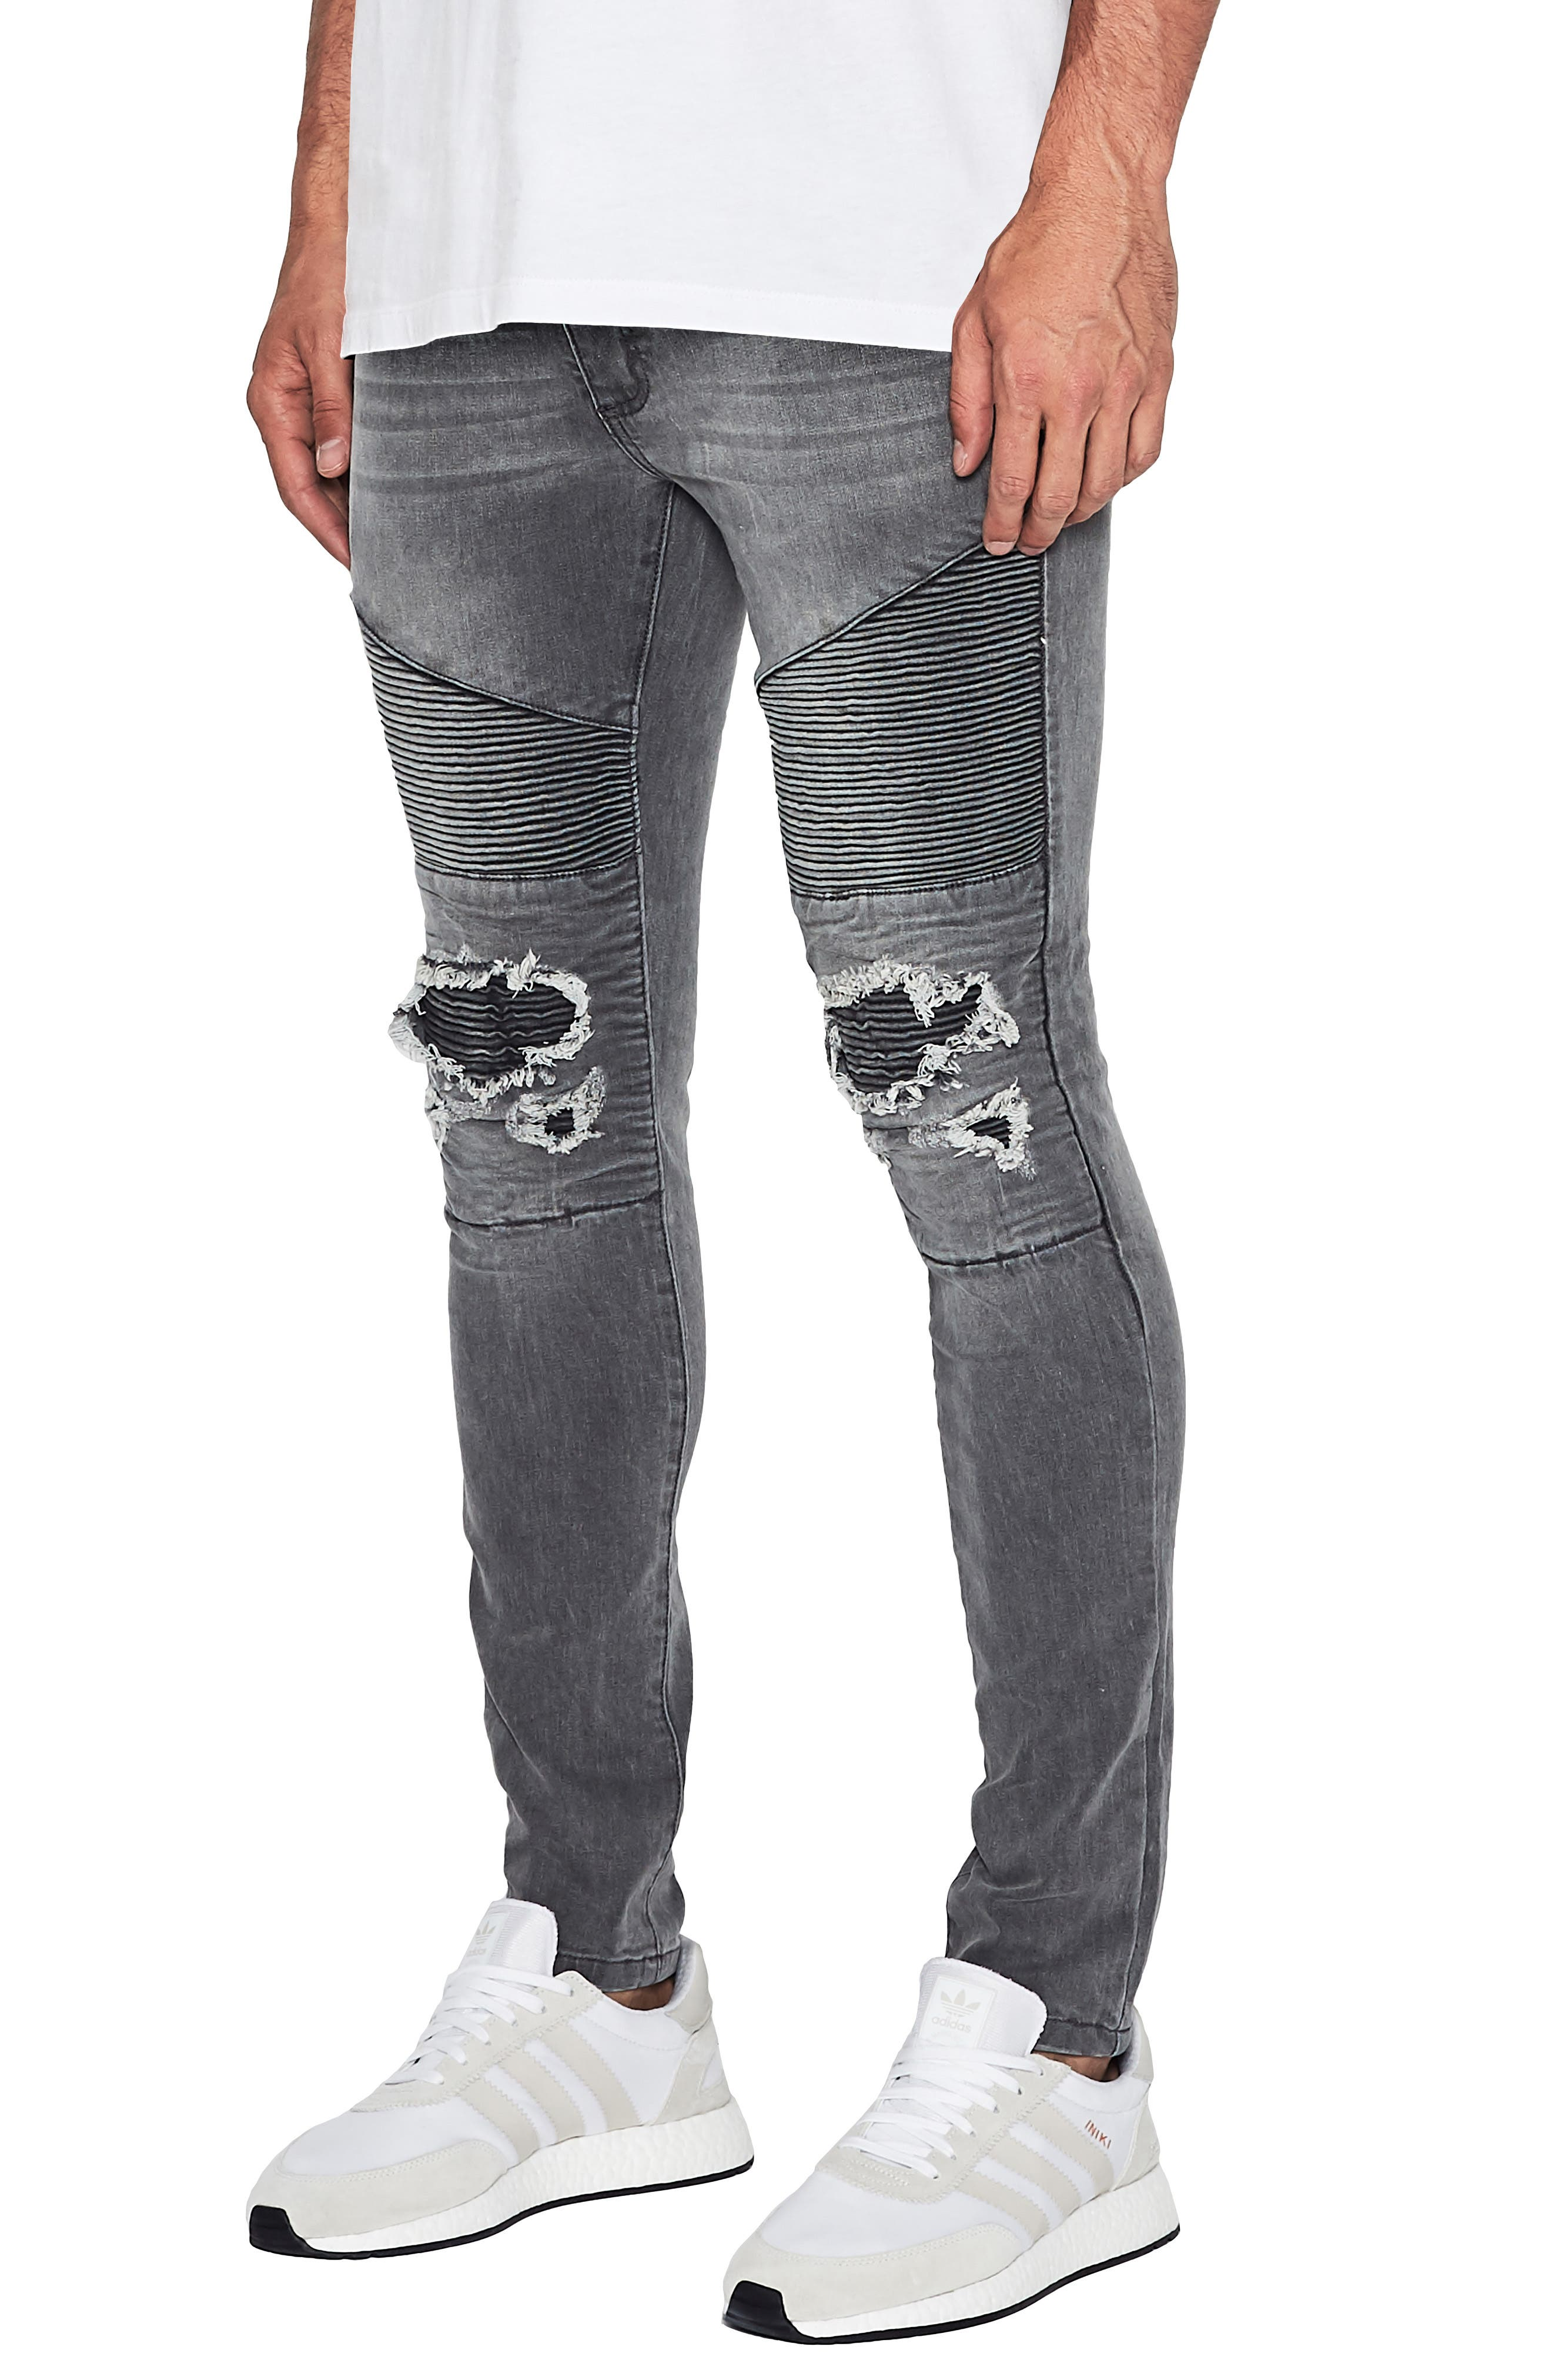 Combination Moto Skinny Moto Jeans,                             Alternate thumbnail 3, color,                             GREY TRASH